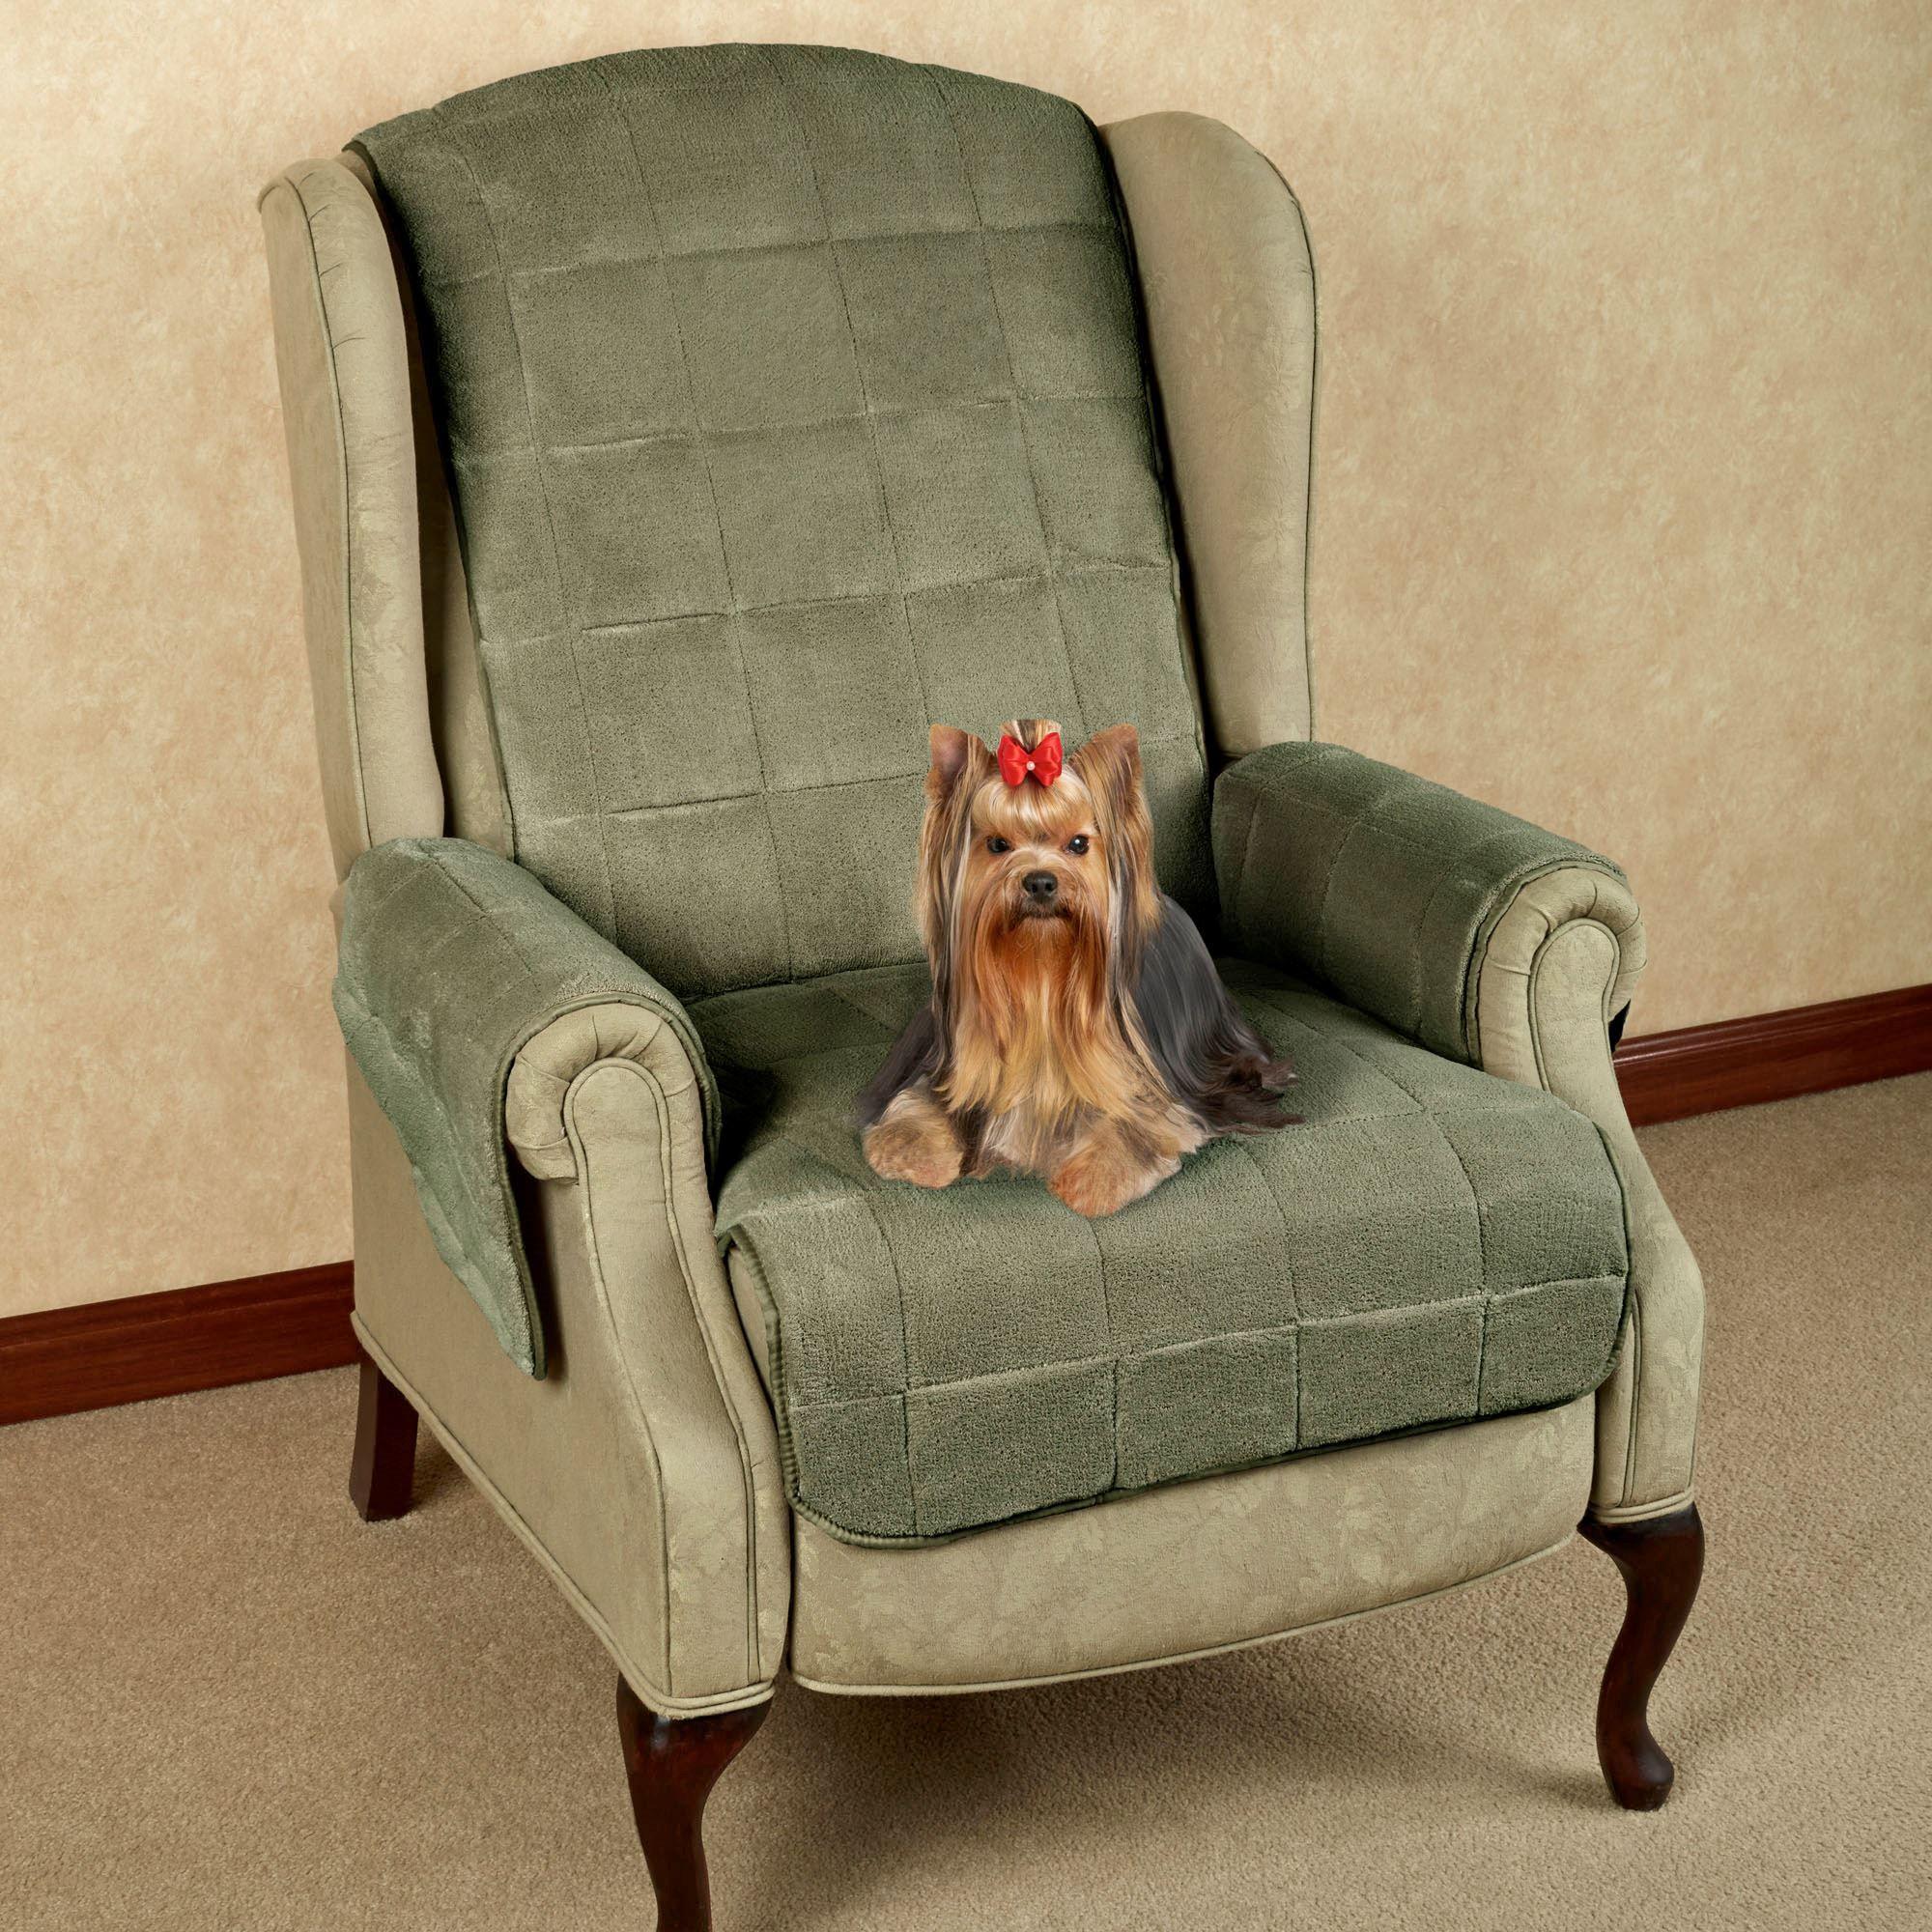 Enjoyable Microplush Pet Furniture Covers With Longer Back Flap Machost Co Dining Chair Design Ideas Machostcouk